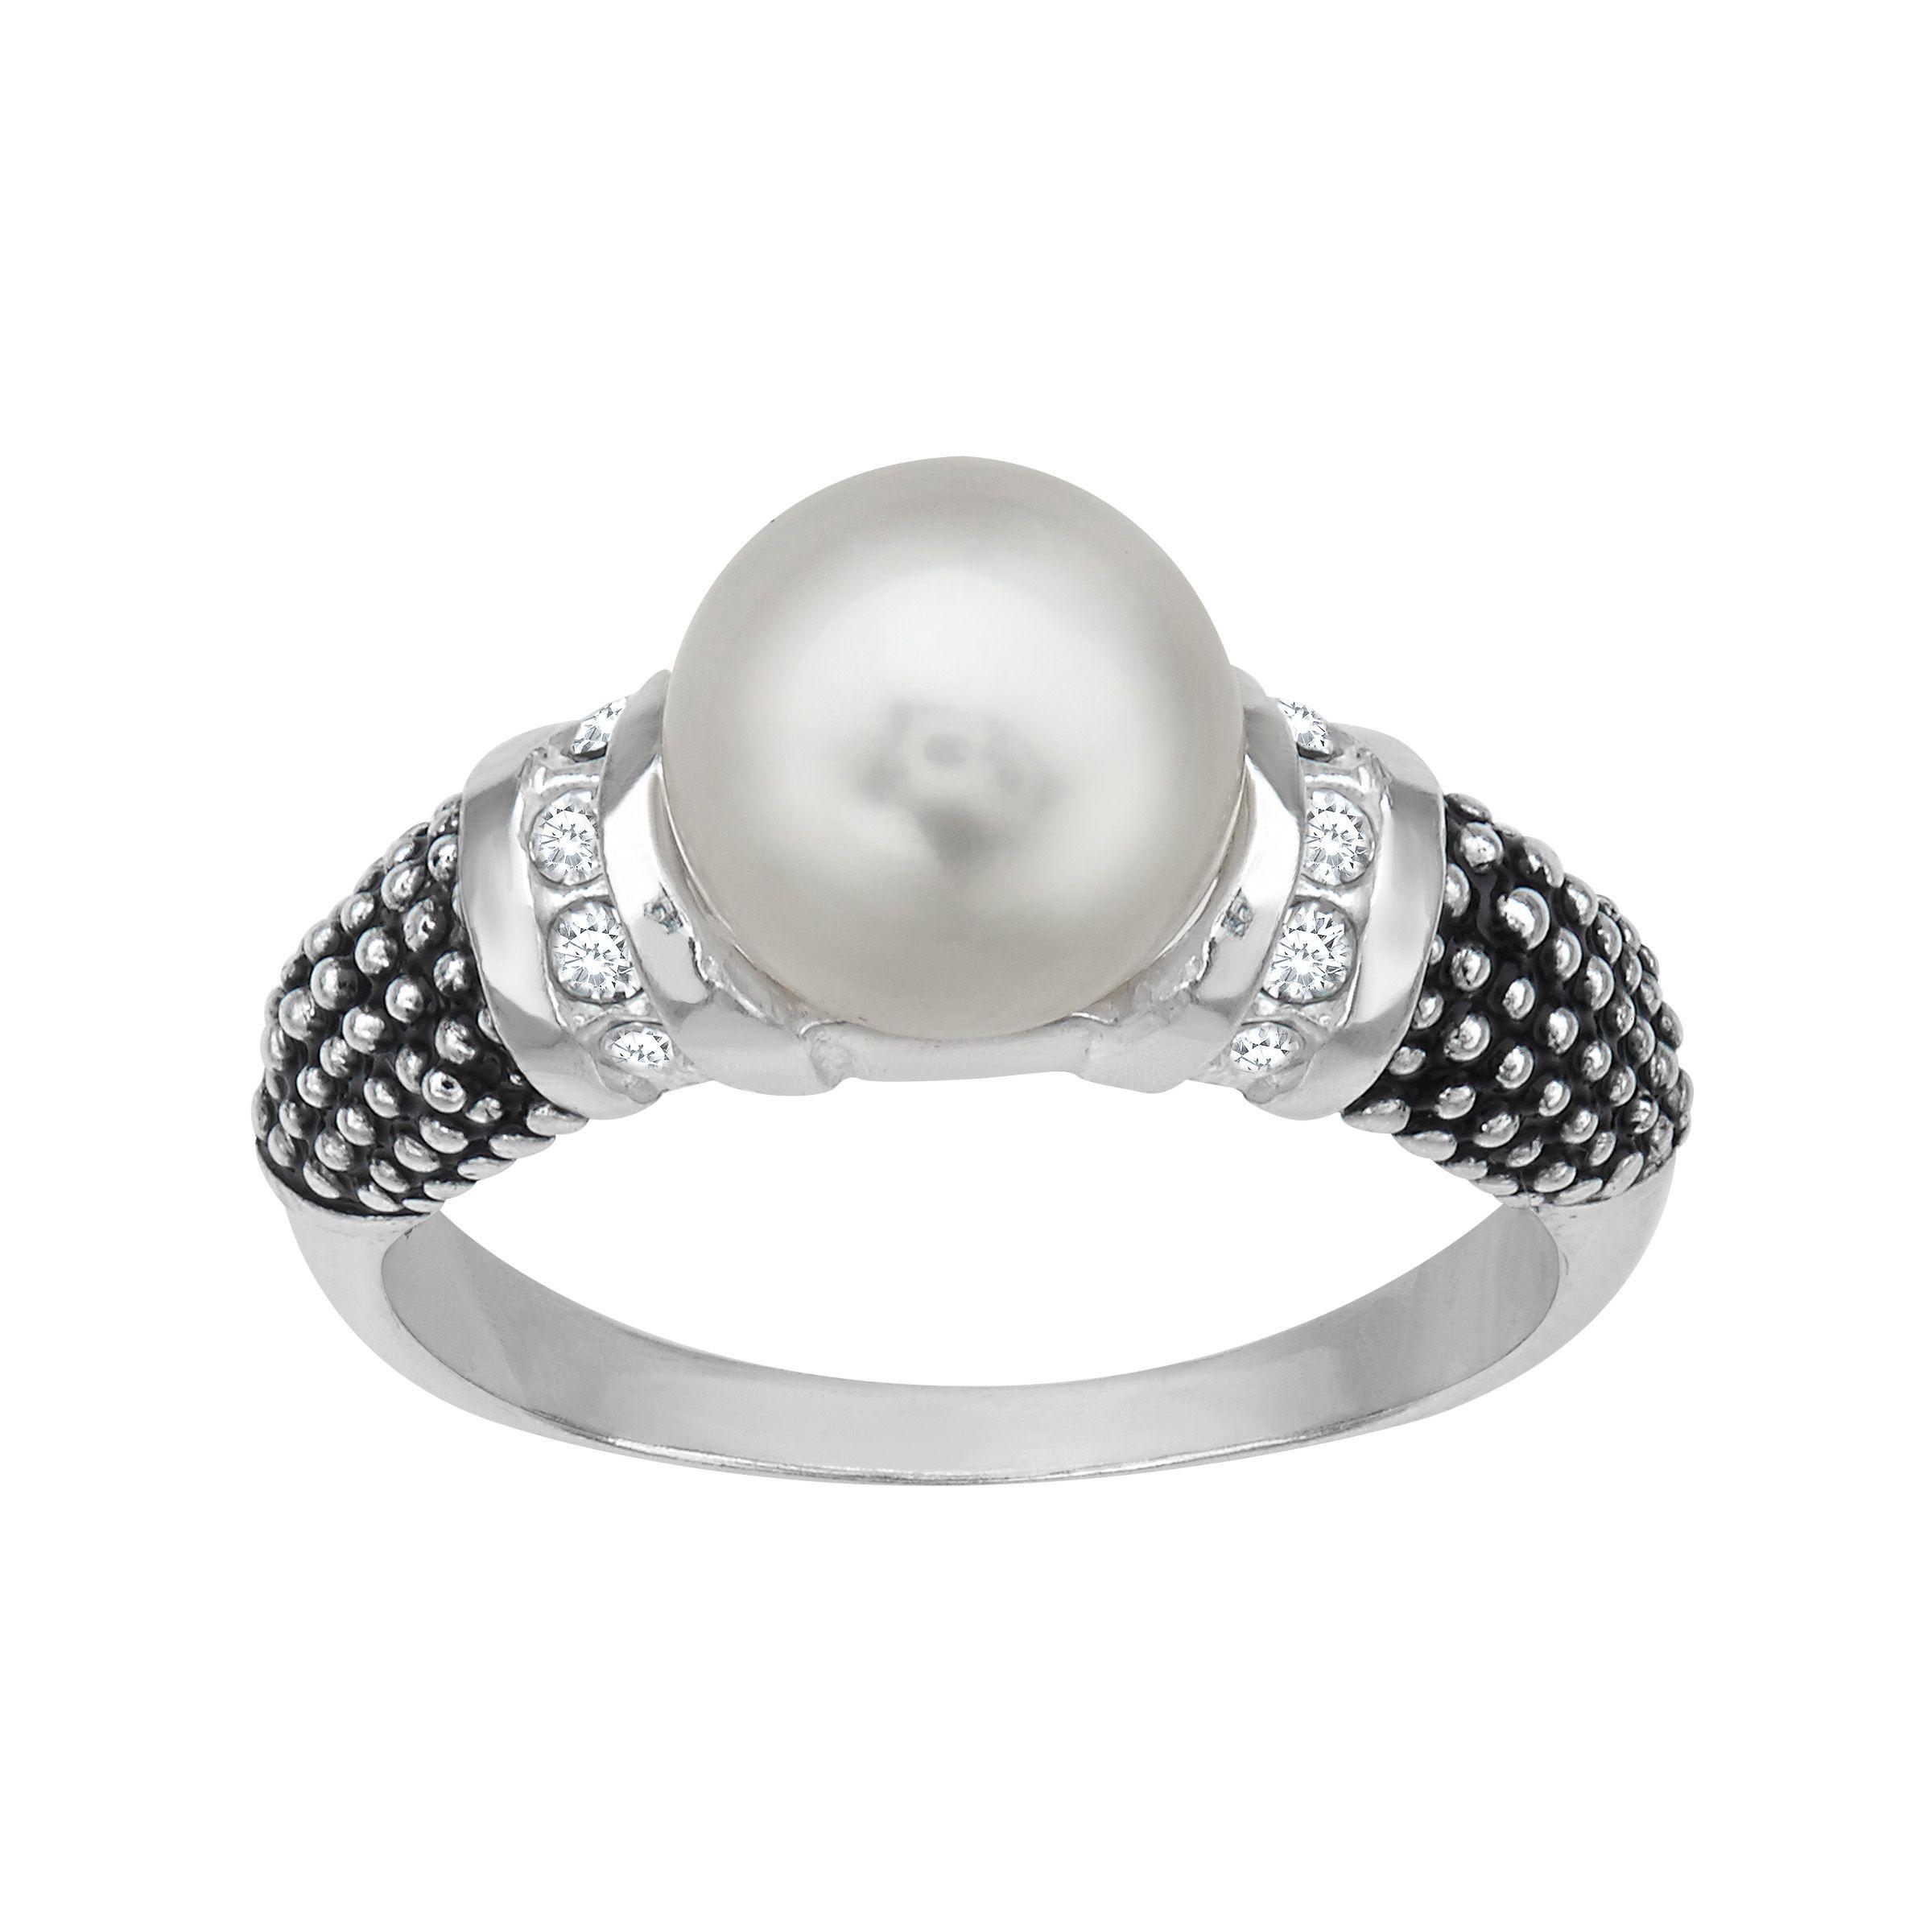 46b5a7c228f6 Aya Azrielant Ring with Swarovski Freshwater Pearl   Crystal in Sterling  Silver